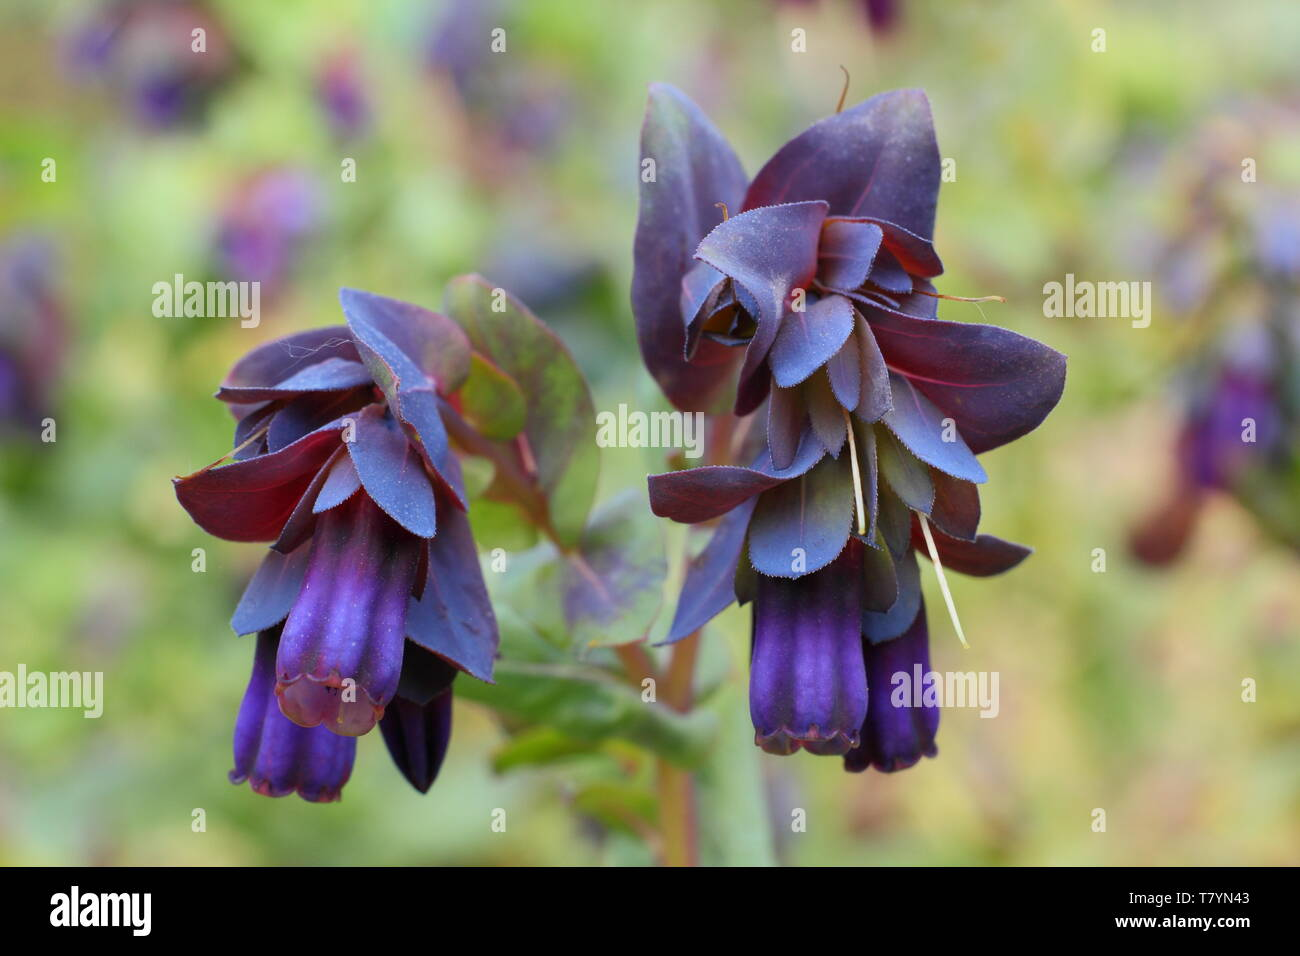 Cerinthe major var. 'Purpurascens'.  Nodding purple bells of bee friendly honeywort in mid spring - Stock Image